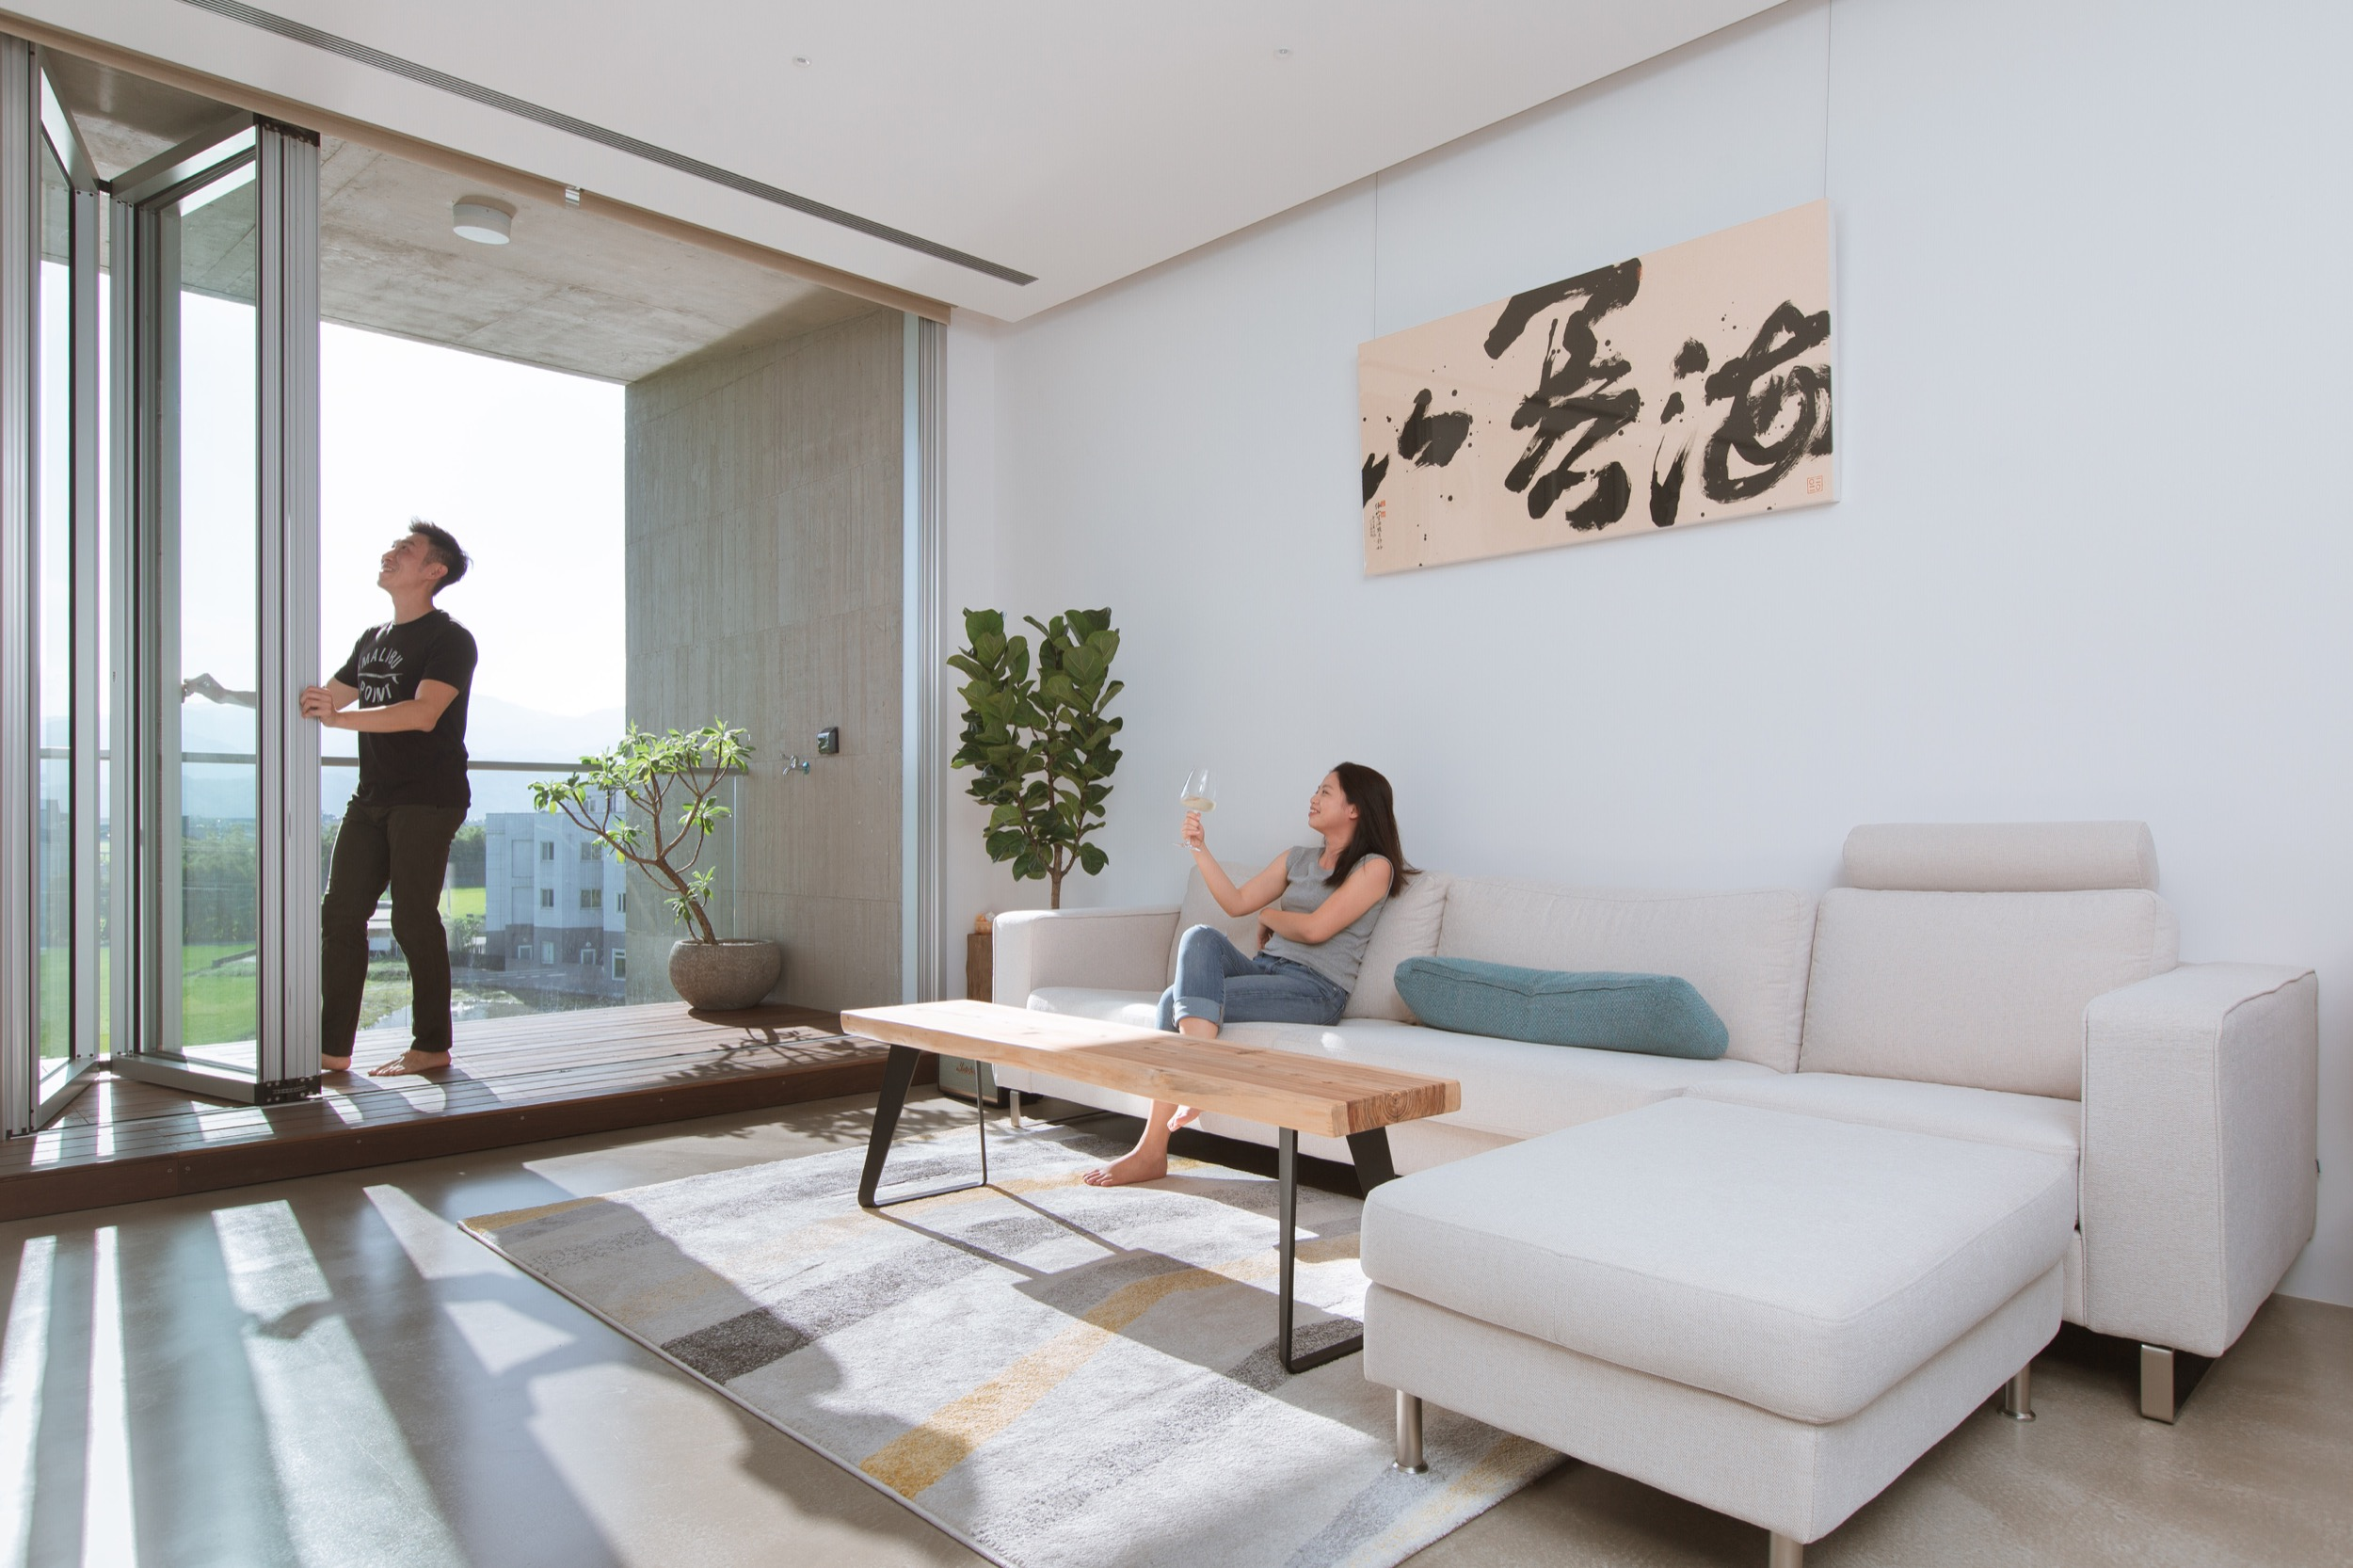 德築-DEZU-project-Zutian-architecture-interior-design-interview-10